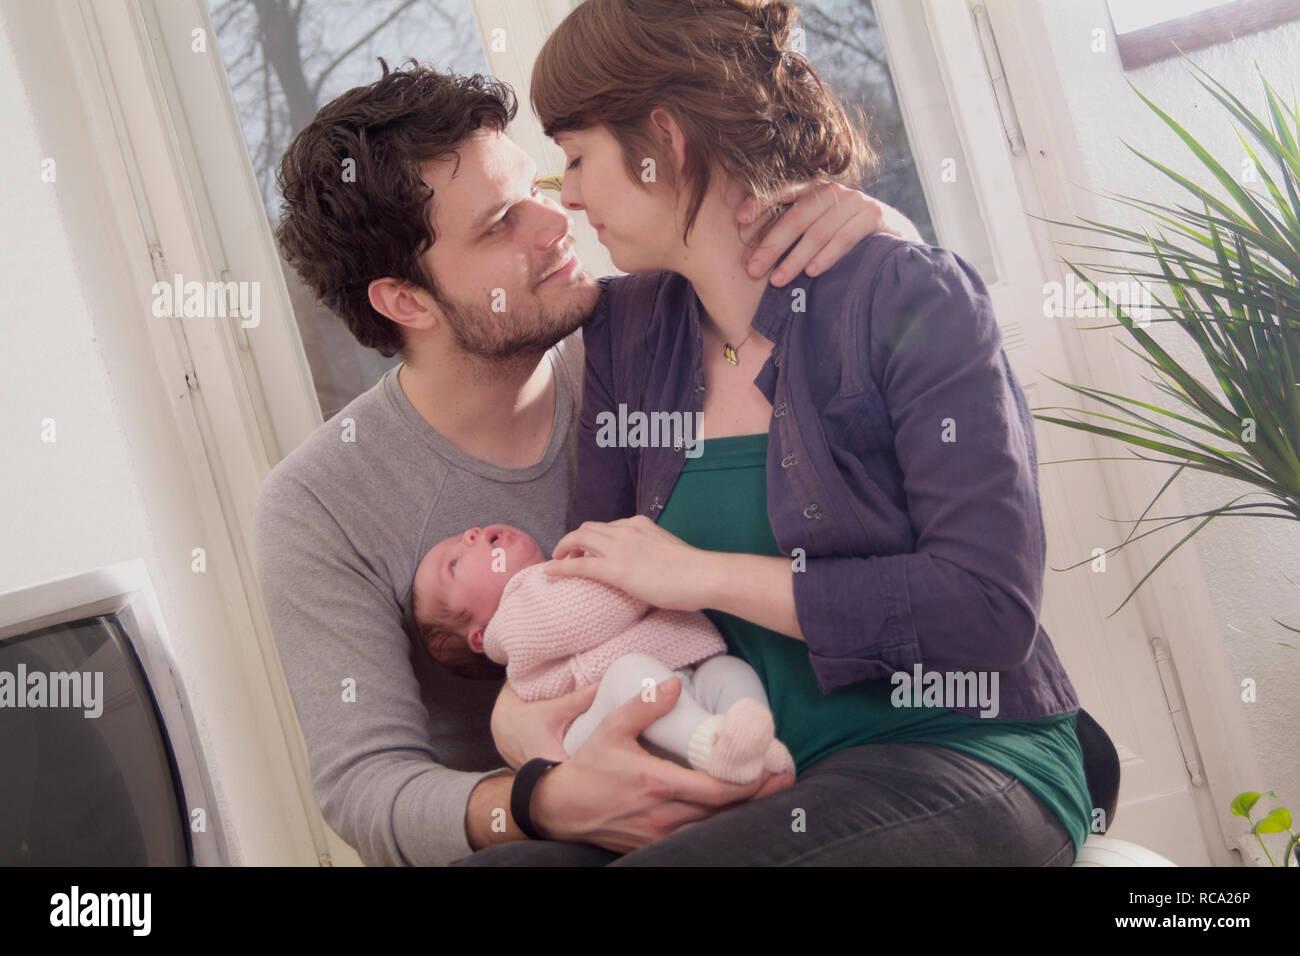 Junge Eltern halten ihre neugeborene Tochter im Arm, das Kind ist 12 Tage alt | young parents holding her new born baby in her arms - the baby ist 12  Stock Photo